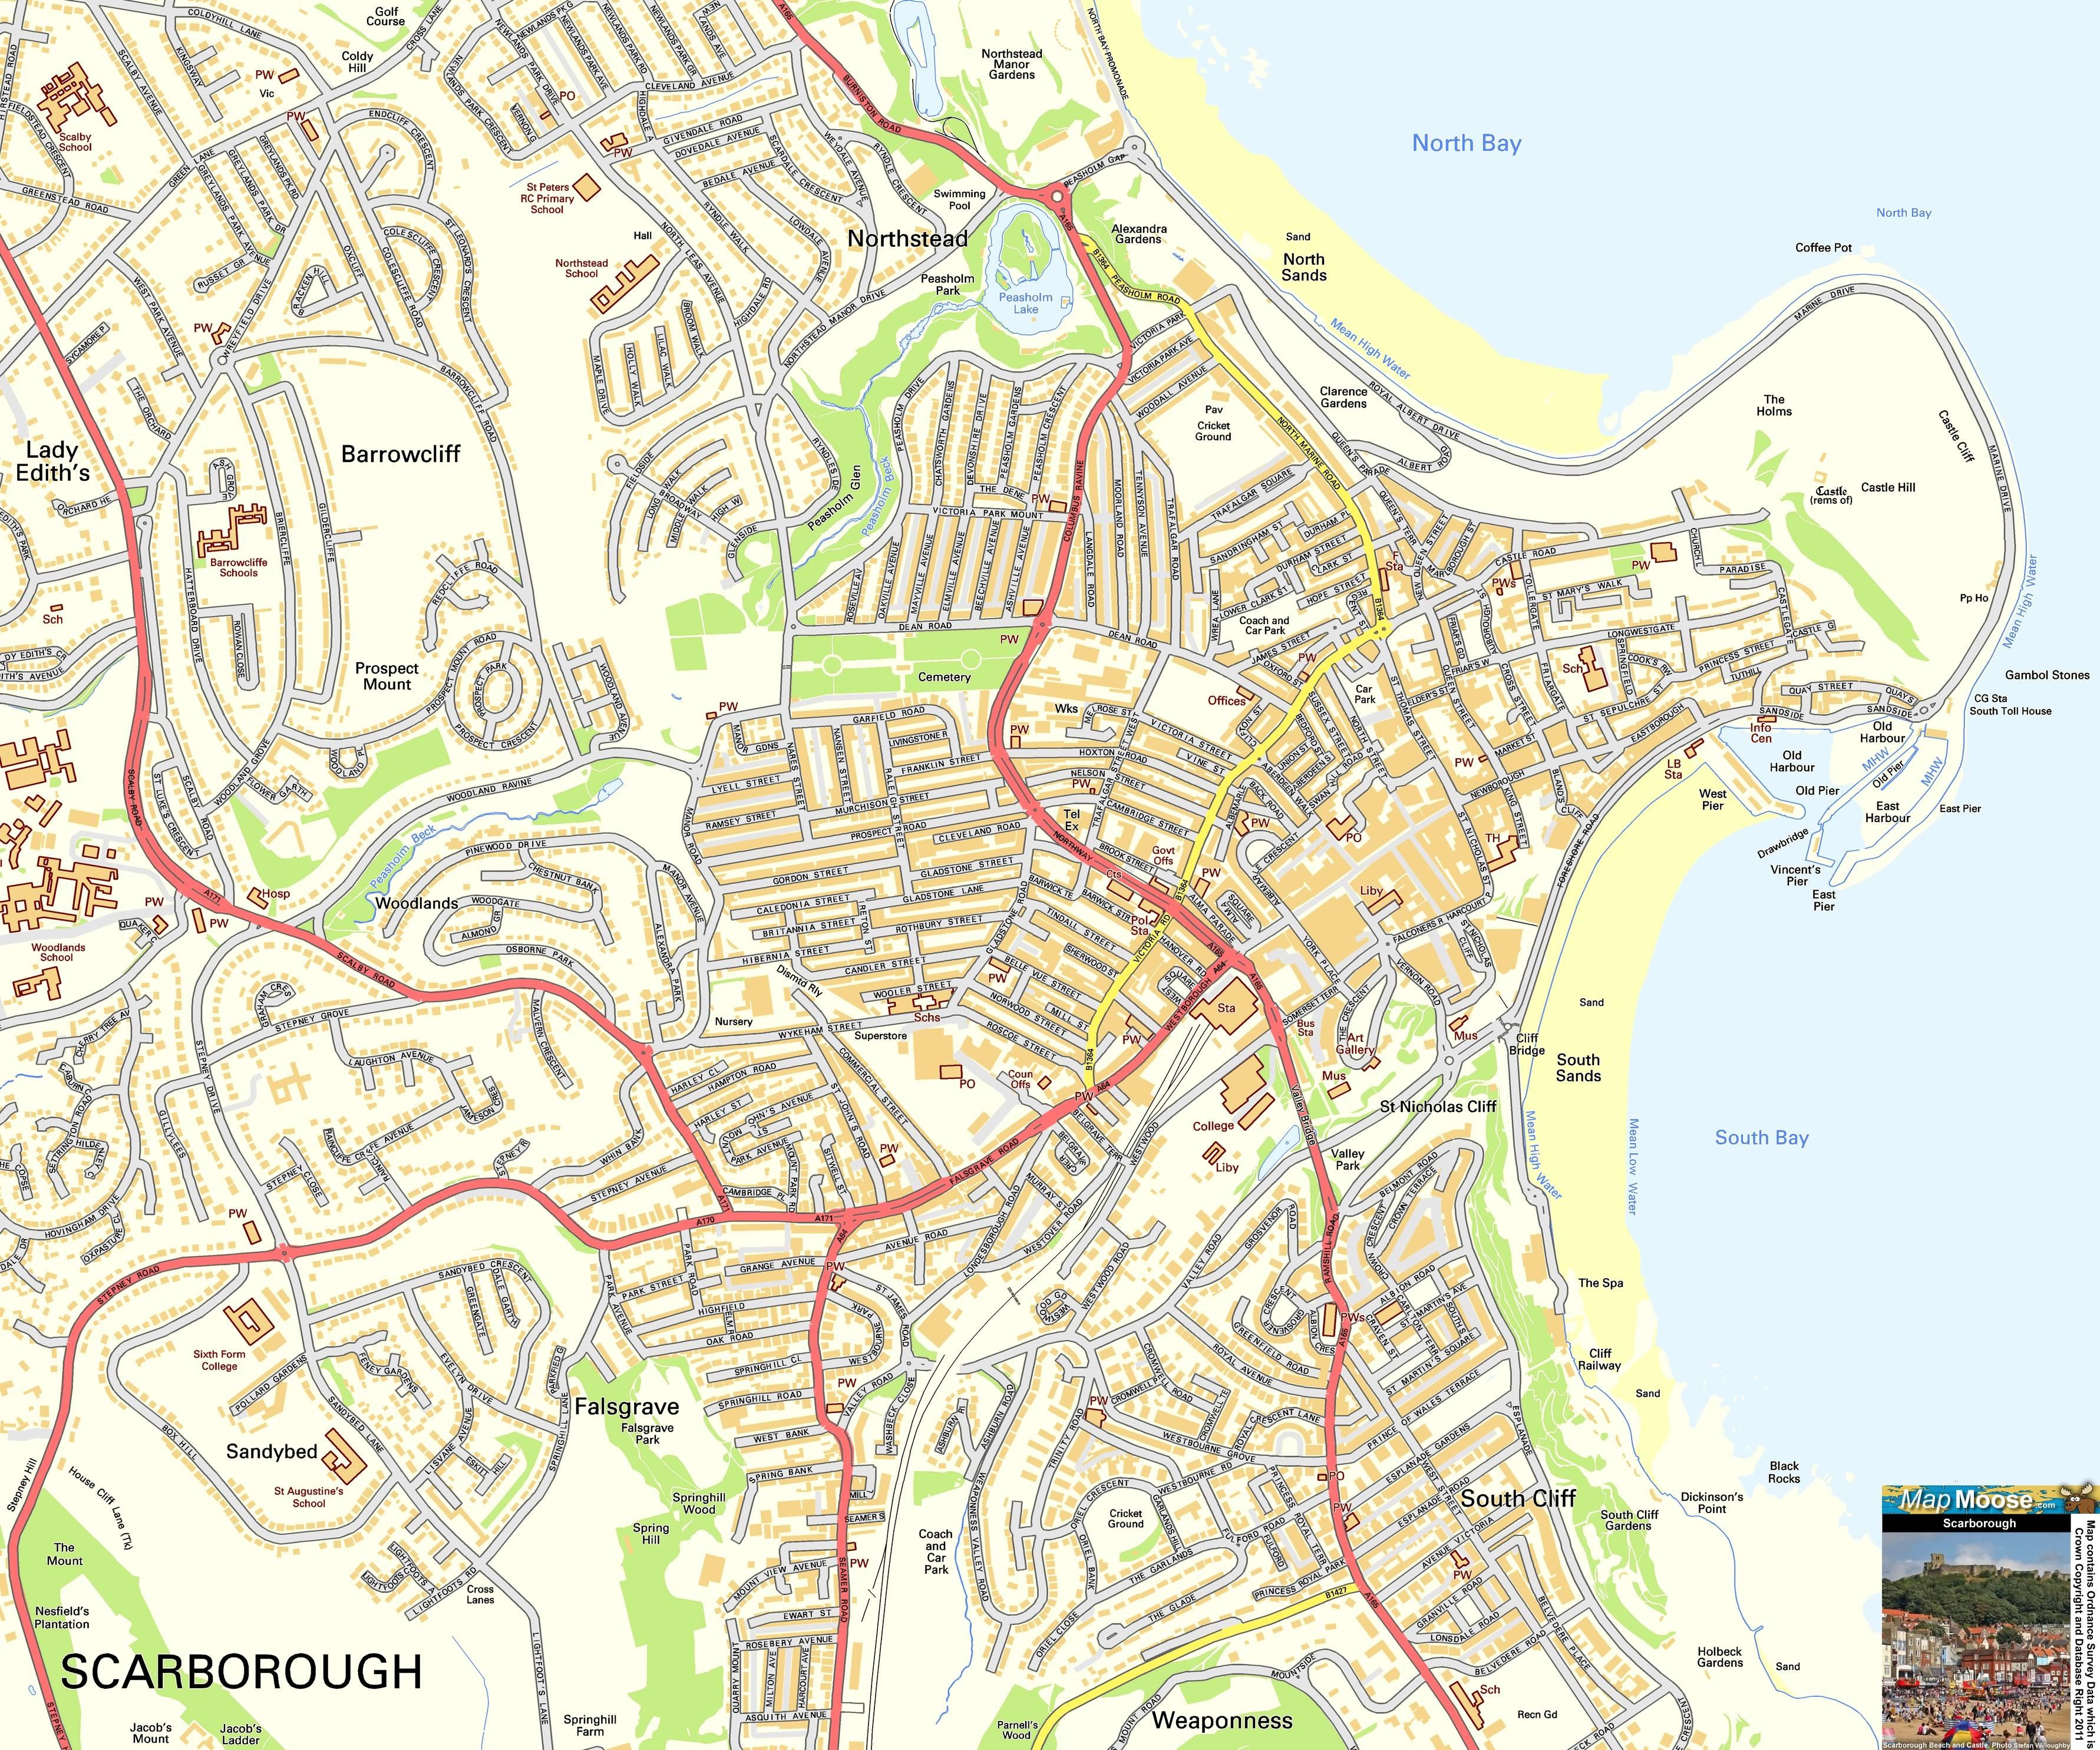 Scarborough Offline Street Map, including Scarborough Castle